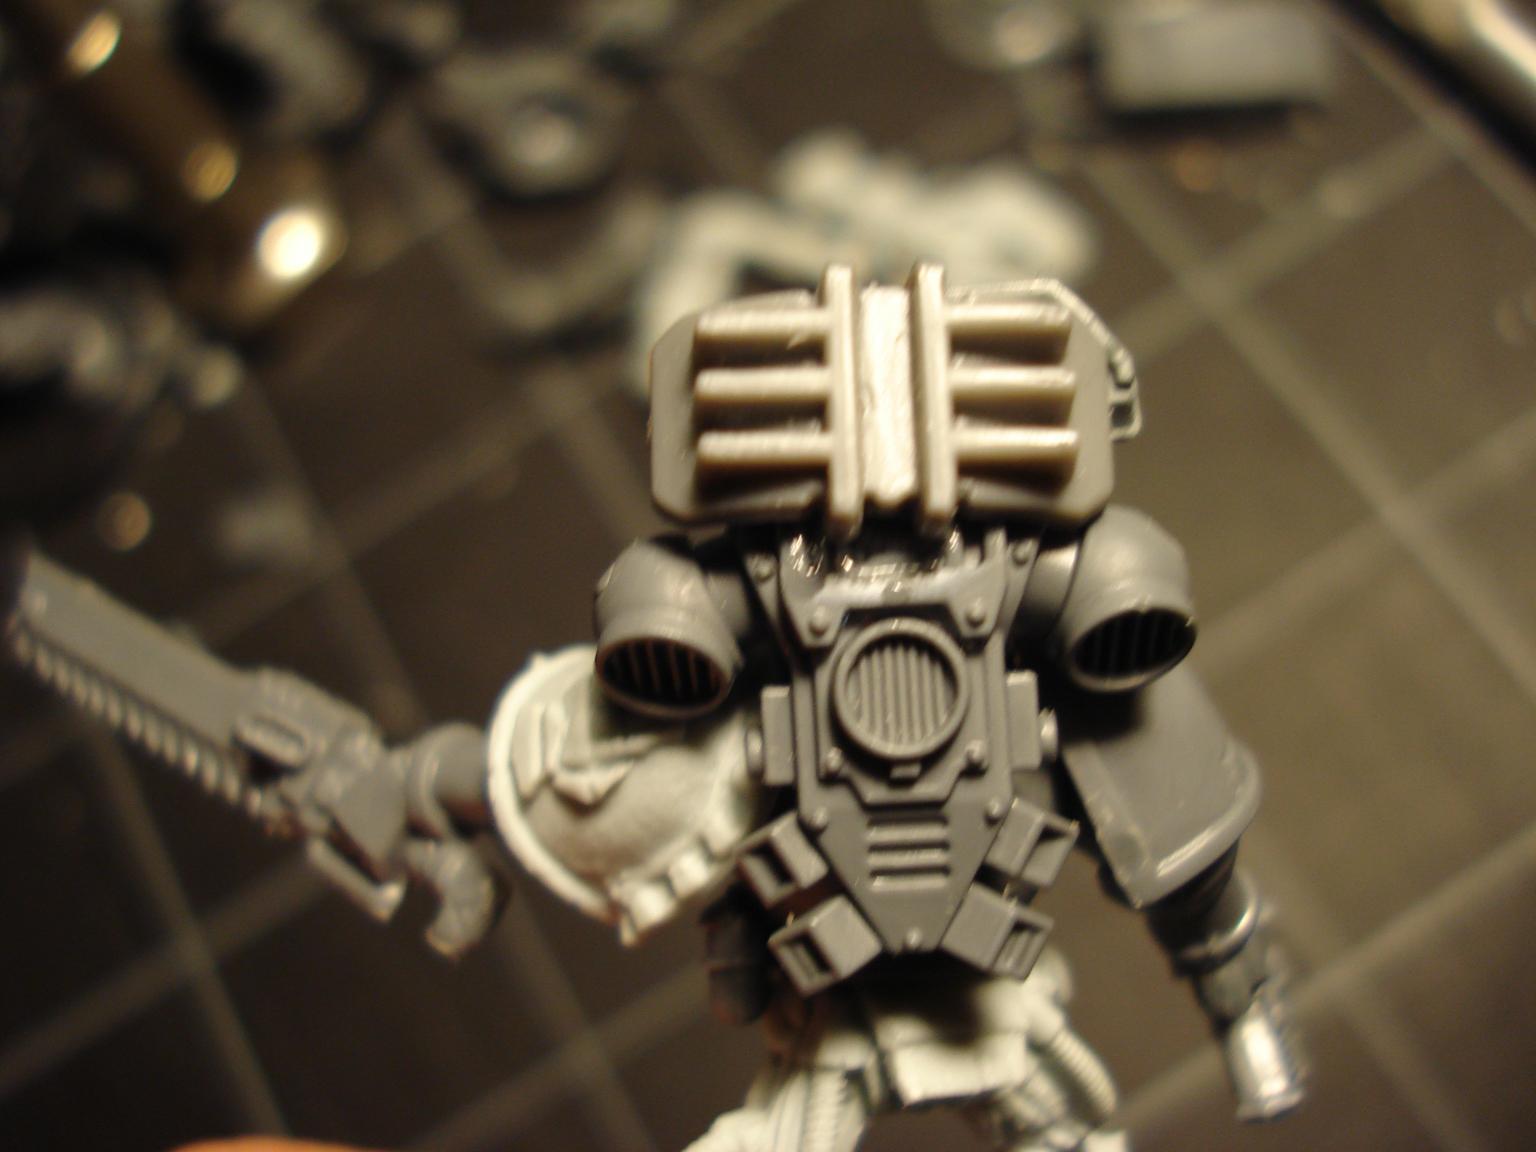 Bionics, Bolter, Iron Hands, Meltagun, Power Fist, Servo Arm, Space Marines, Squad, Techmarine